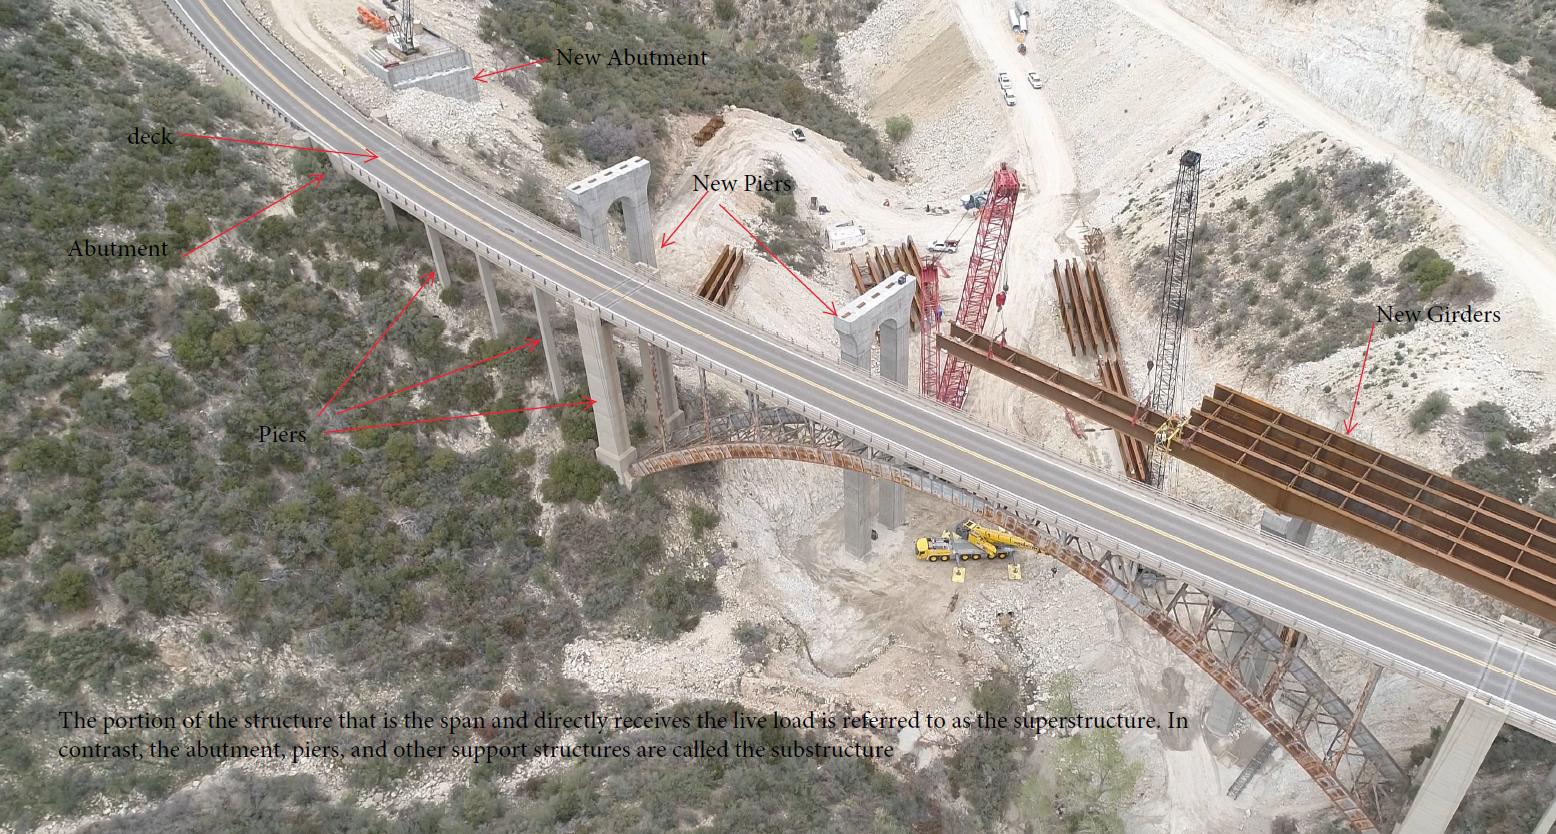 Pinto Creek bridge construction aerial shot labeled